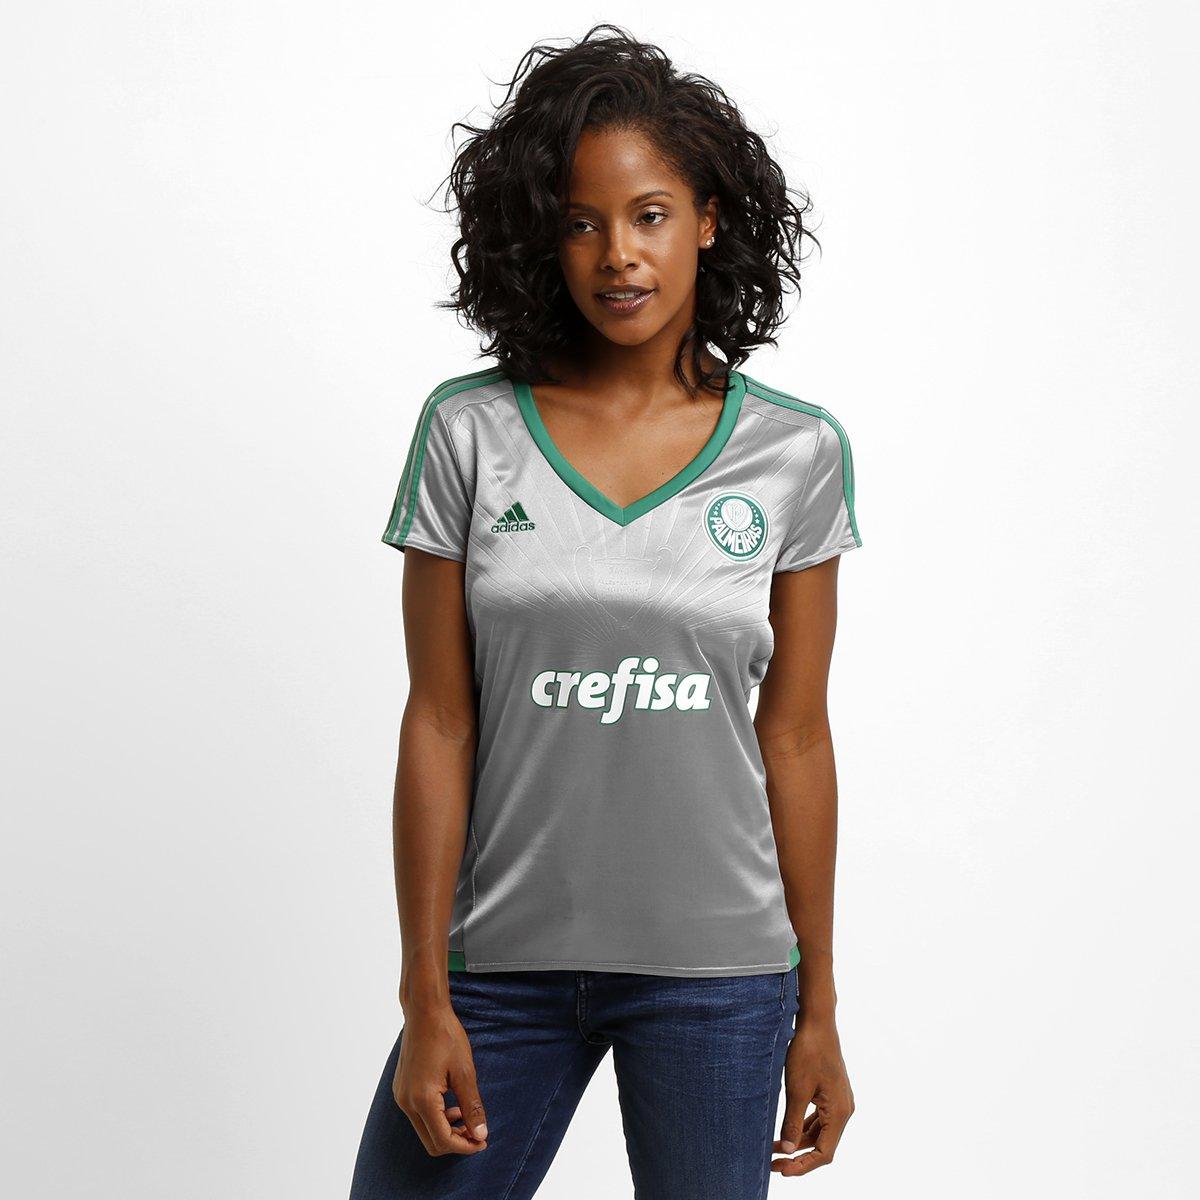 e5e368ee45463 Camisa Feminina Adidas Palmeiras III 15 16 s nº - Compre Agora ...